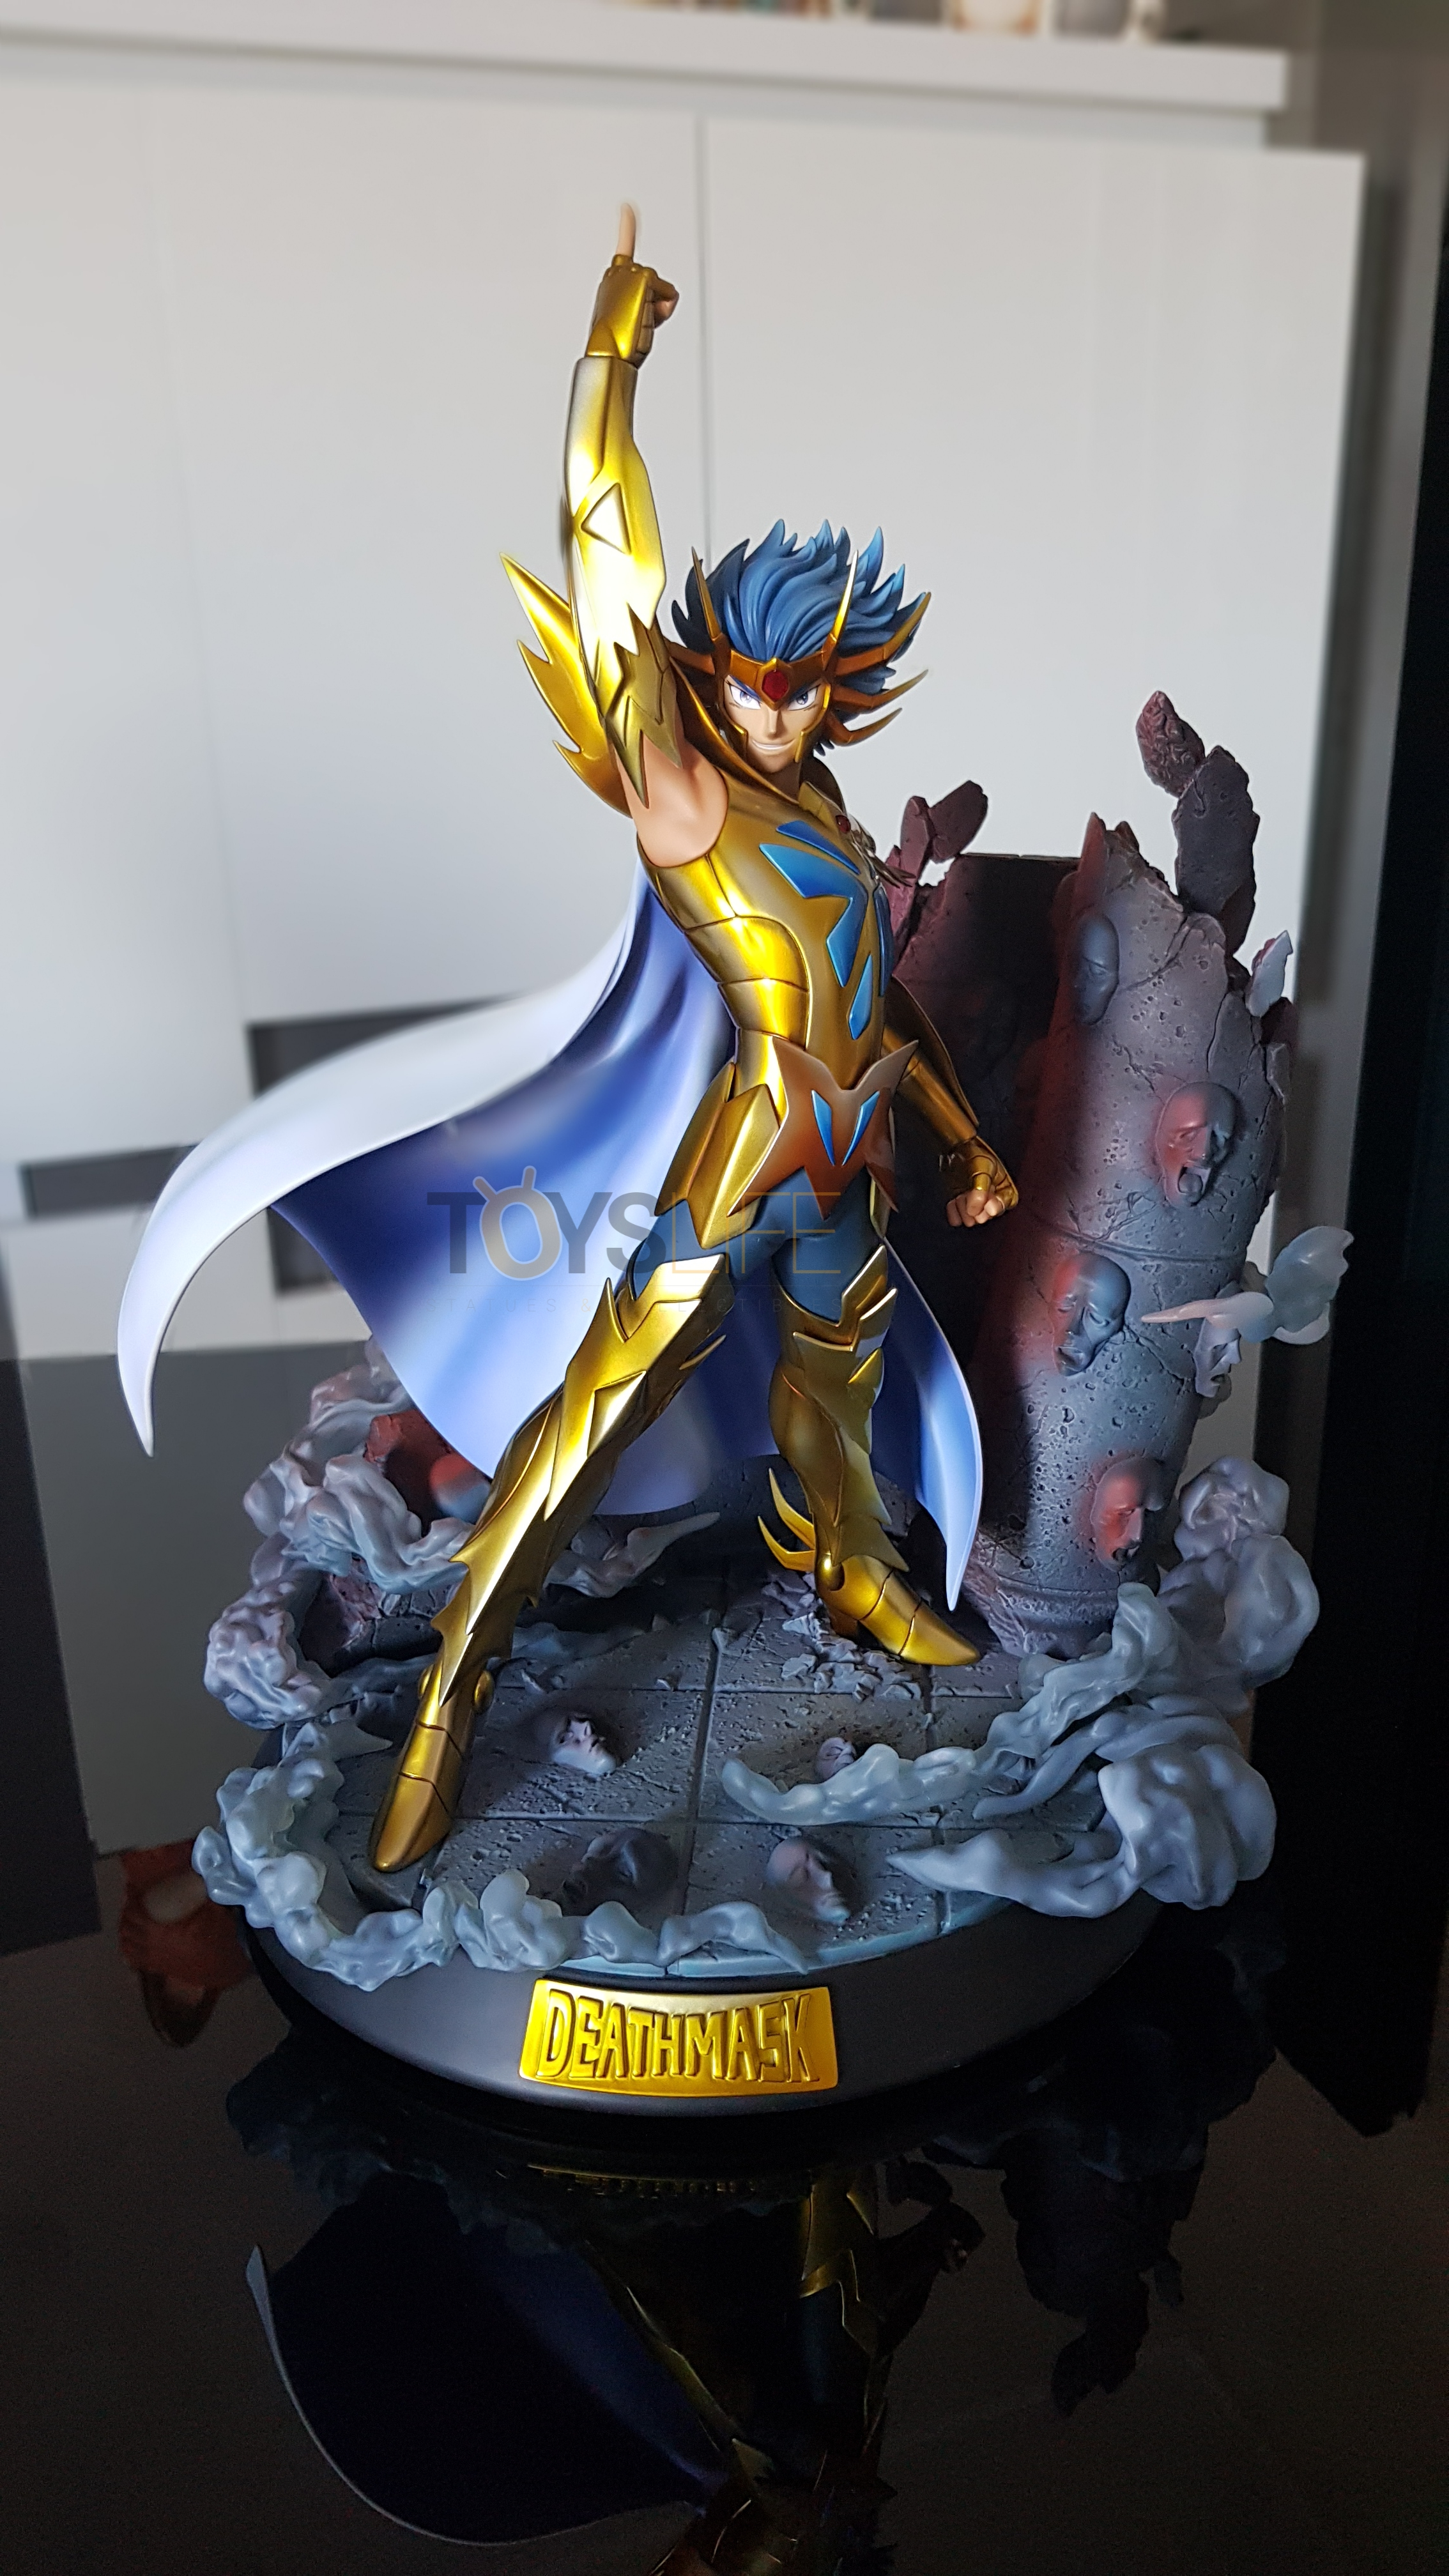 tsume-art-saint-seiya-gold-saint-death-mask-statue-toyslife-review-28